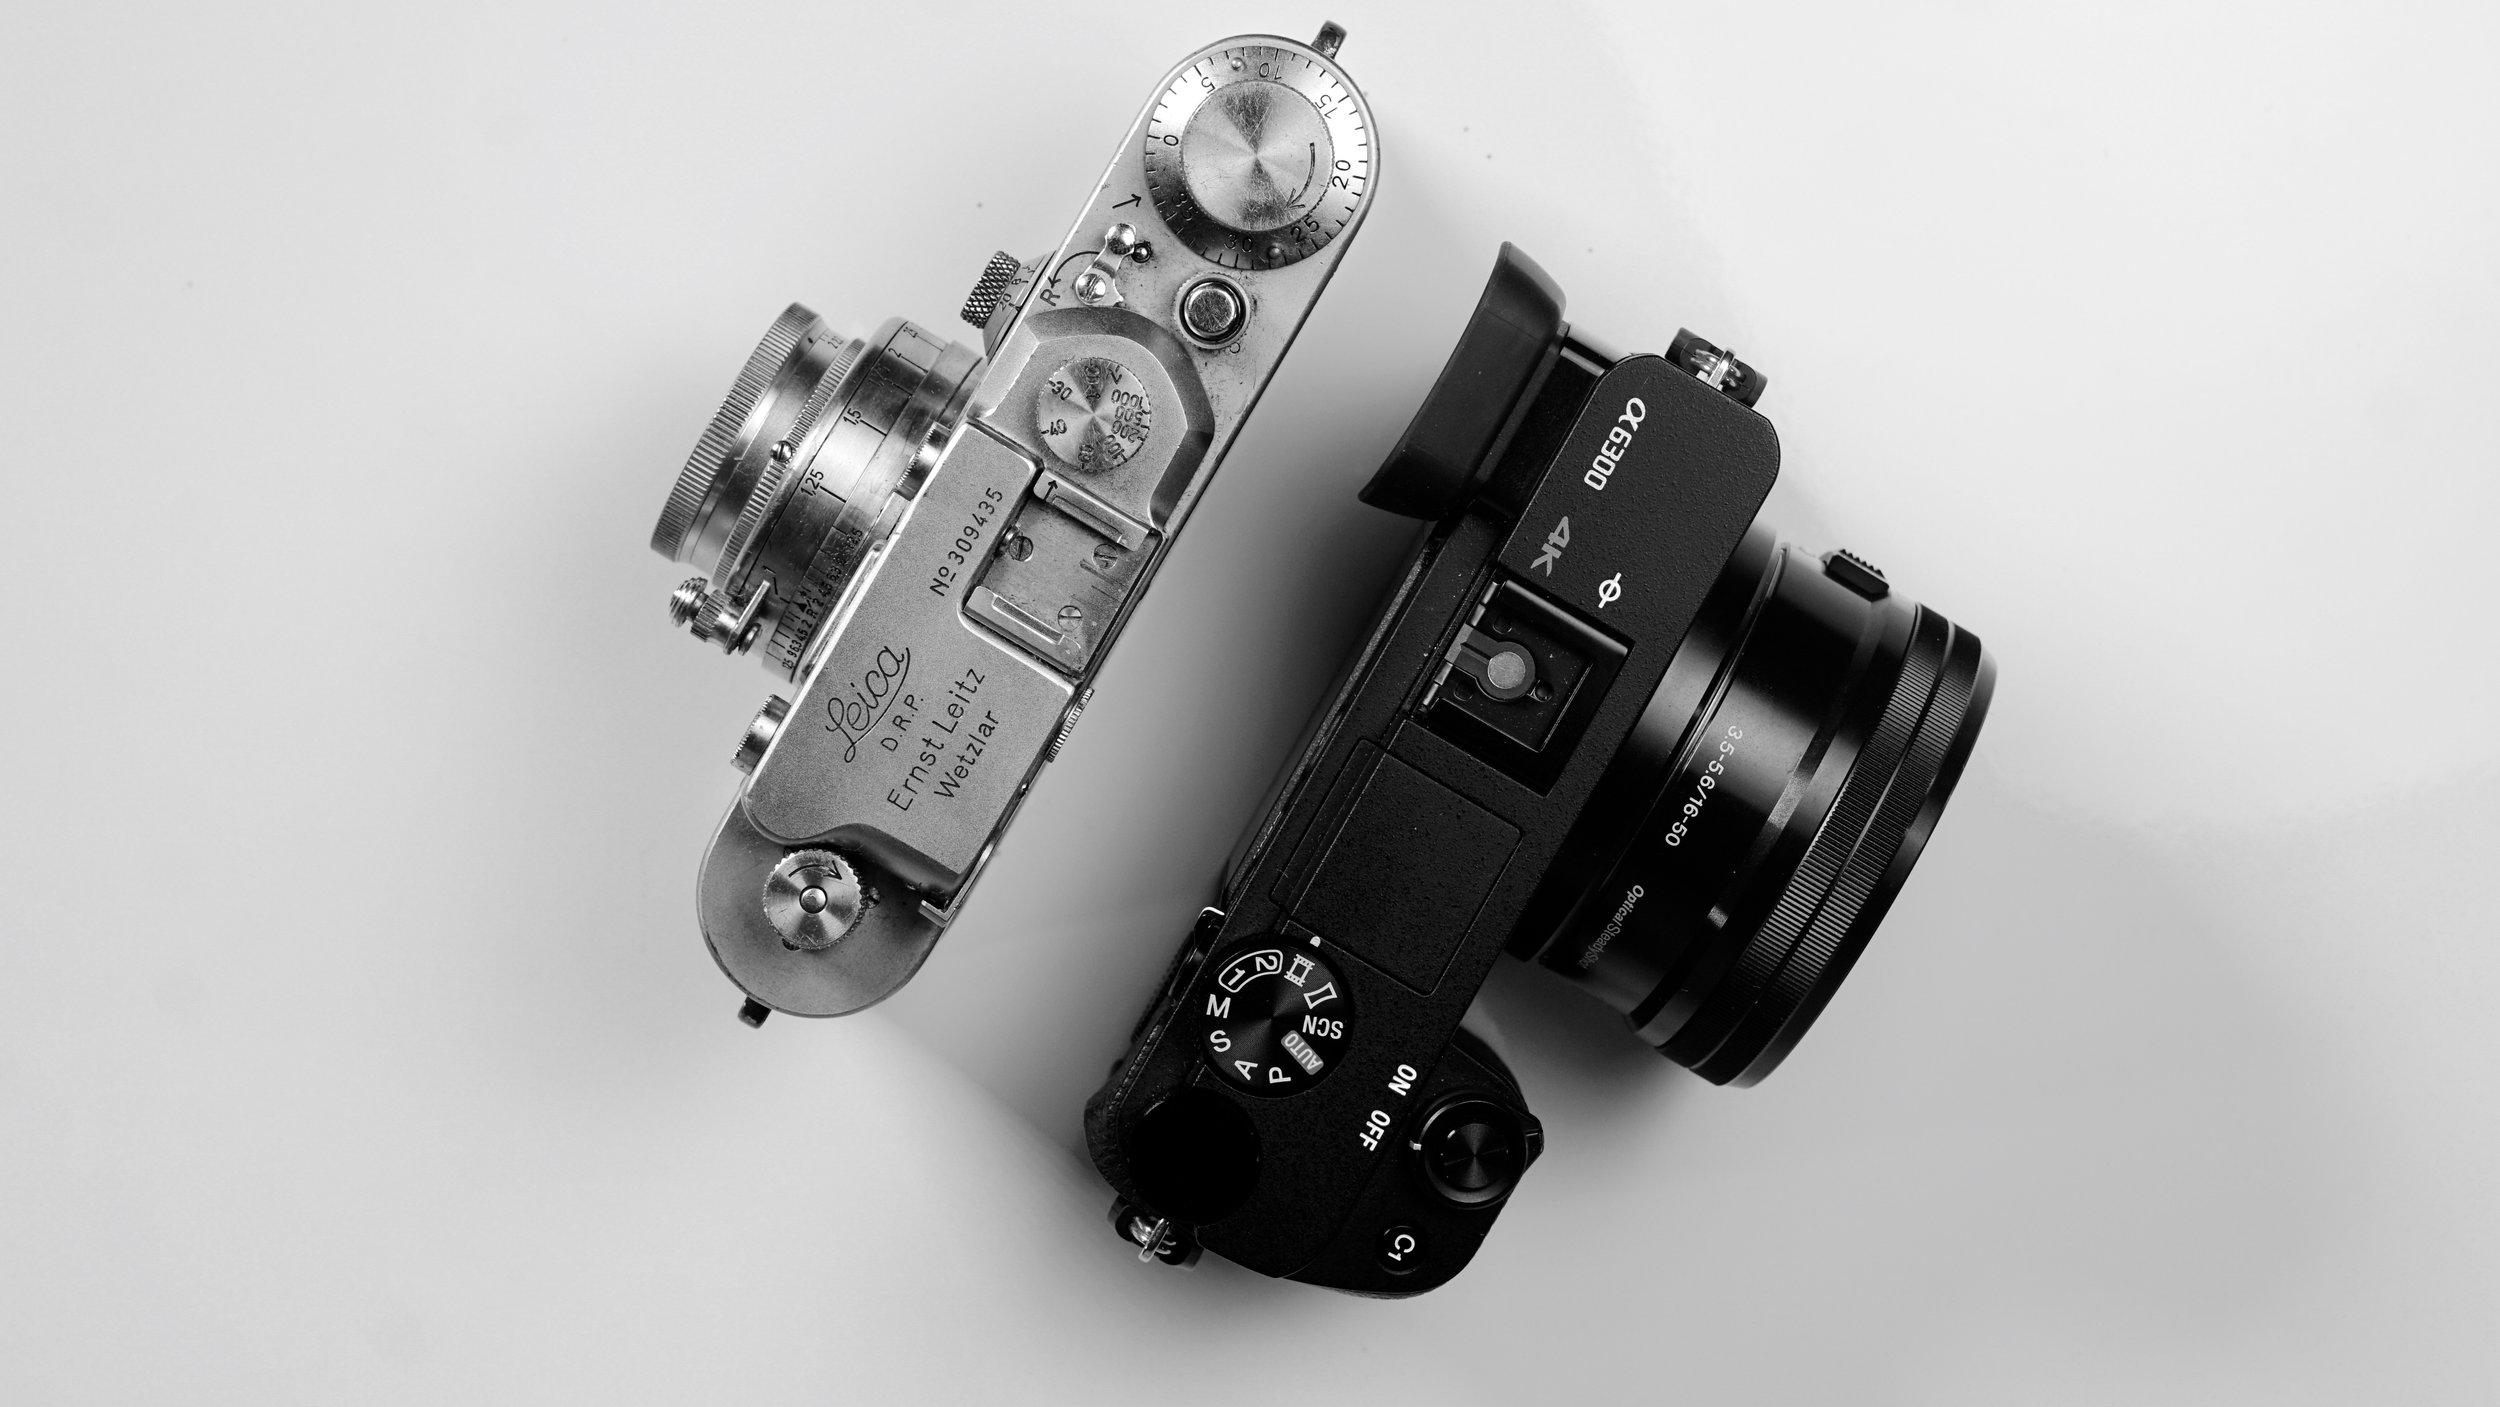 Can you imagine an a6/RX1R II/RX100 V mashup? Whoa.